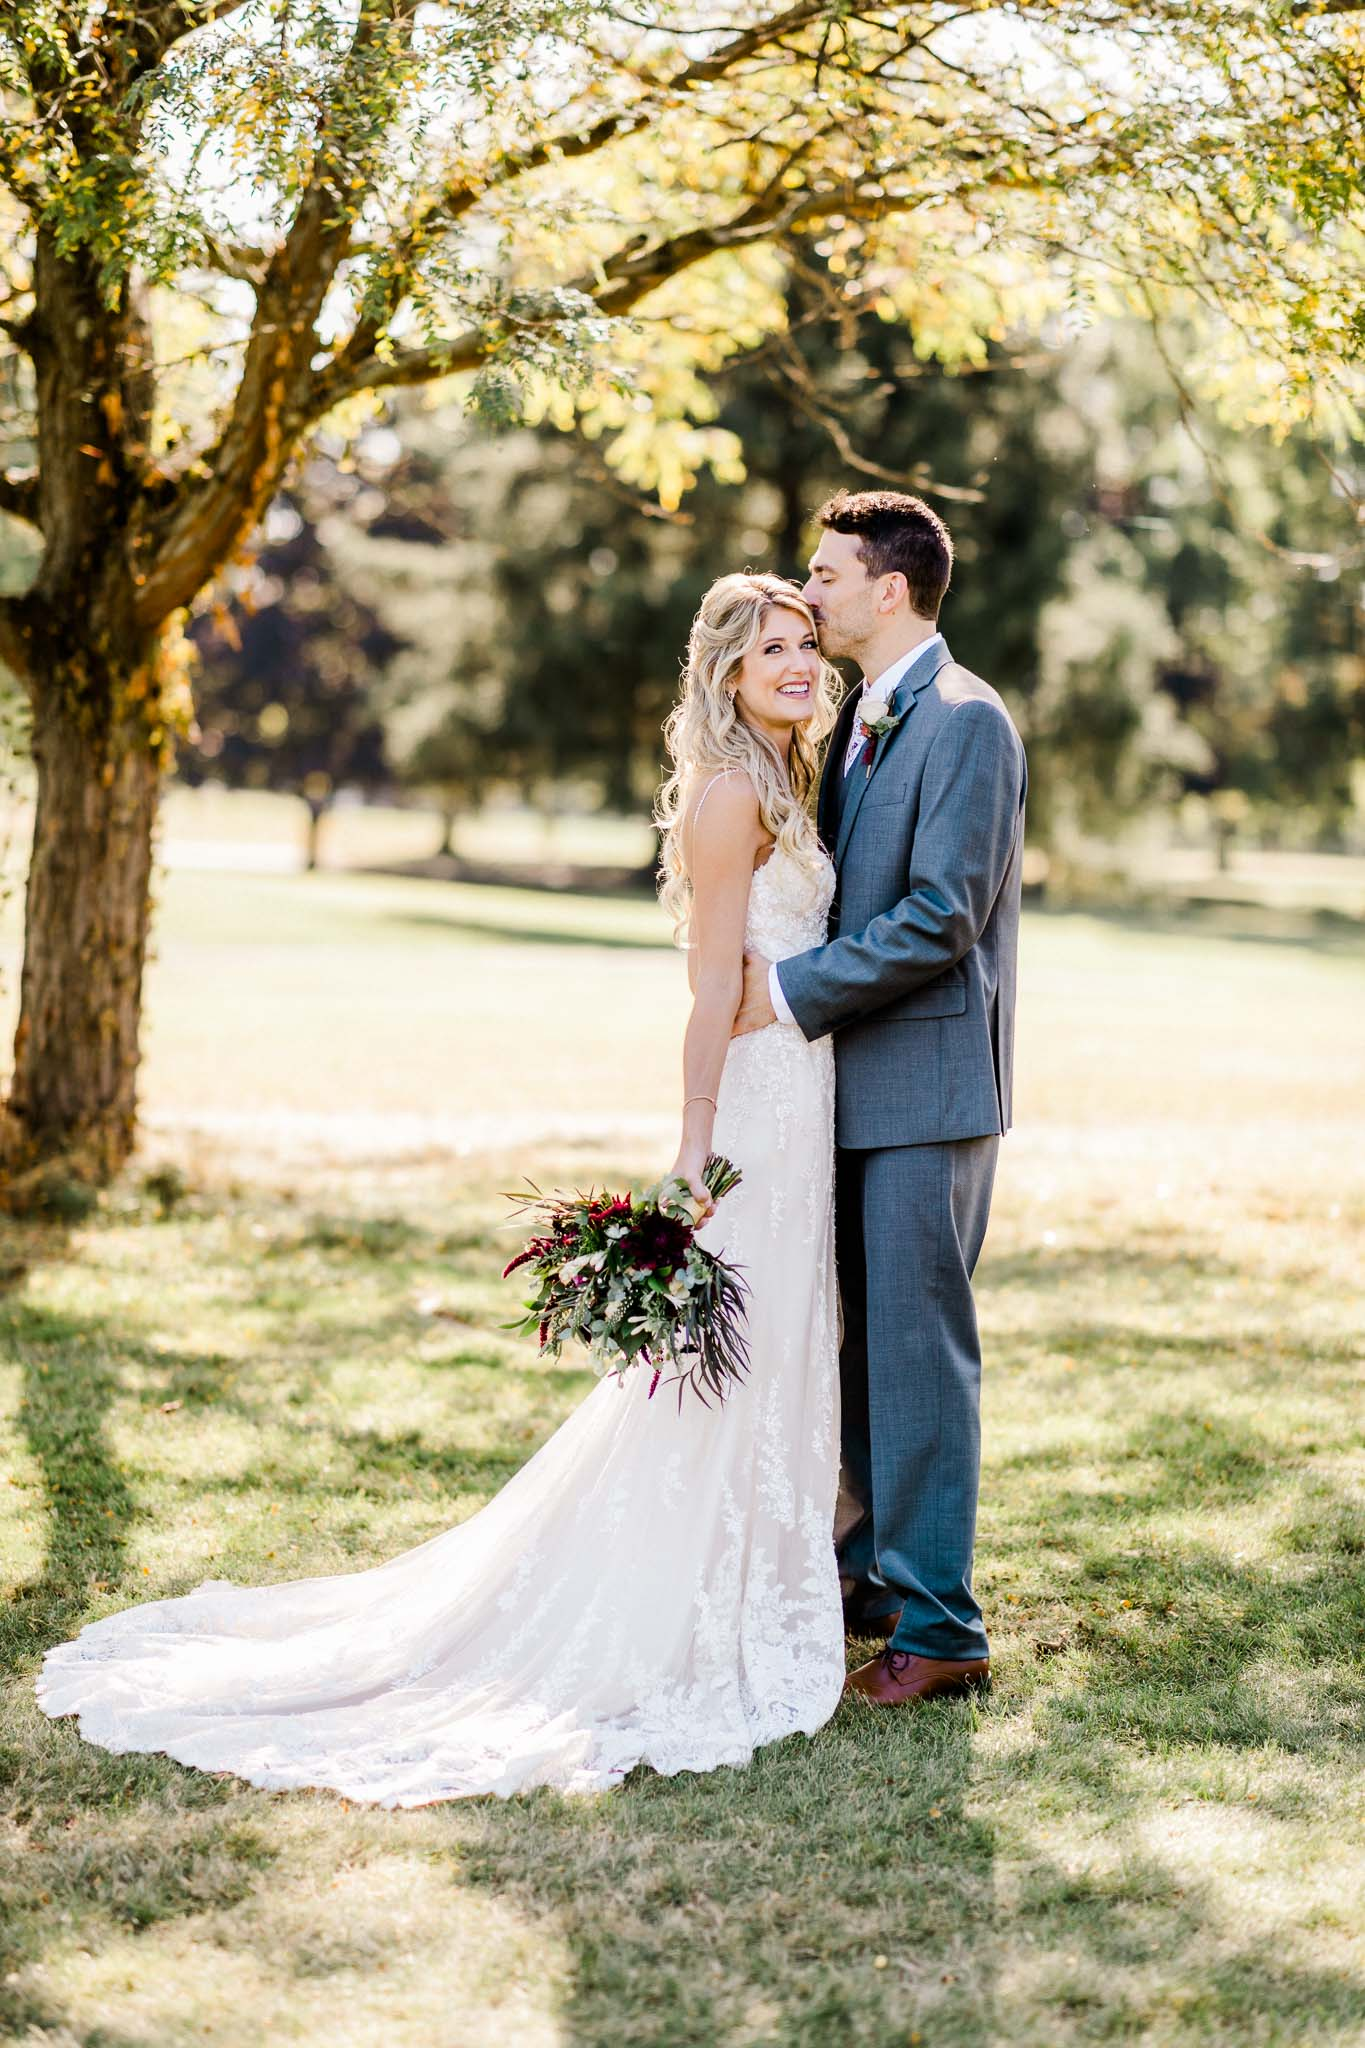 Frosty-Valley-September-Wedding-7480.jpg